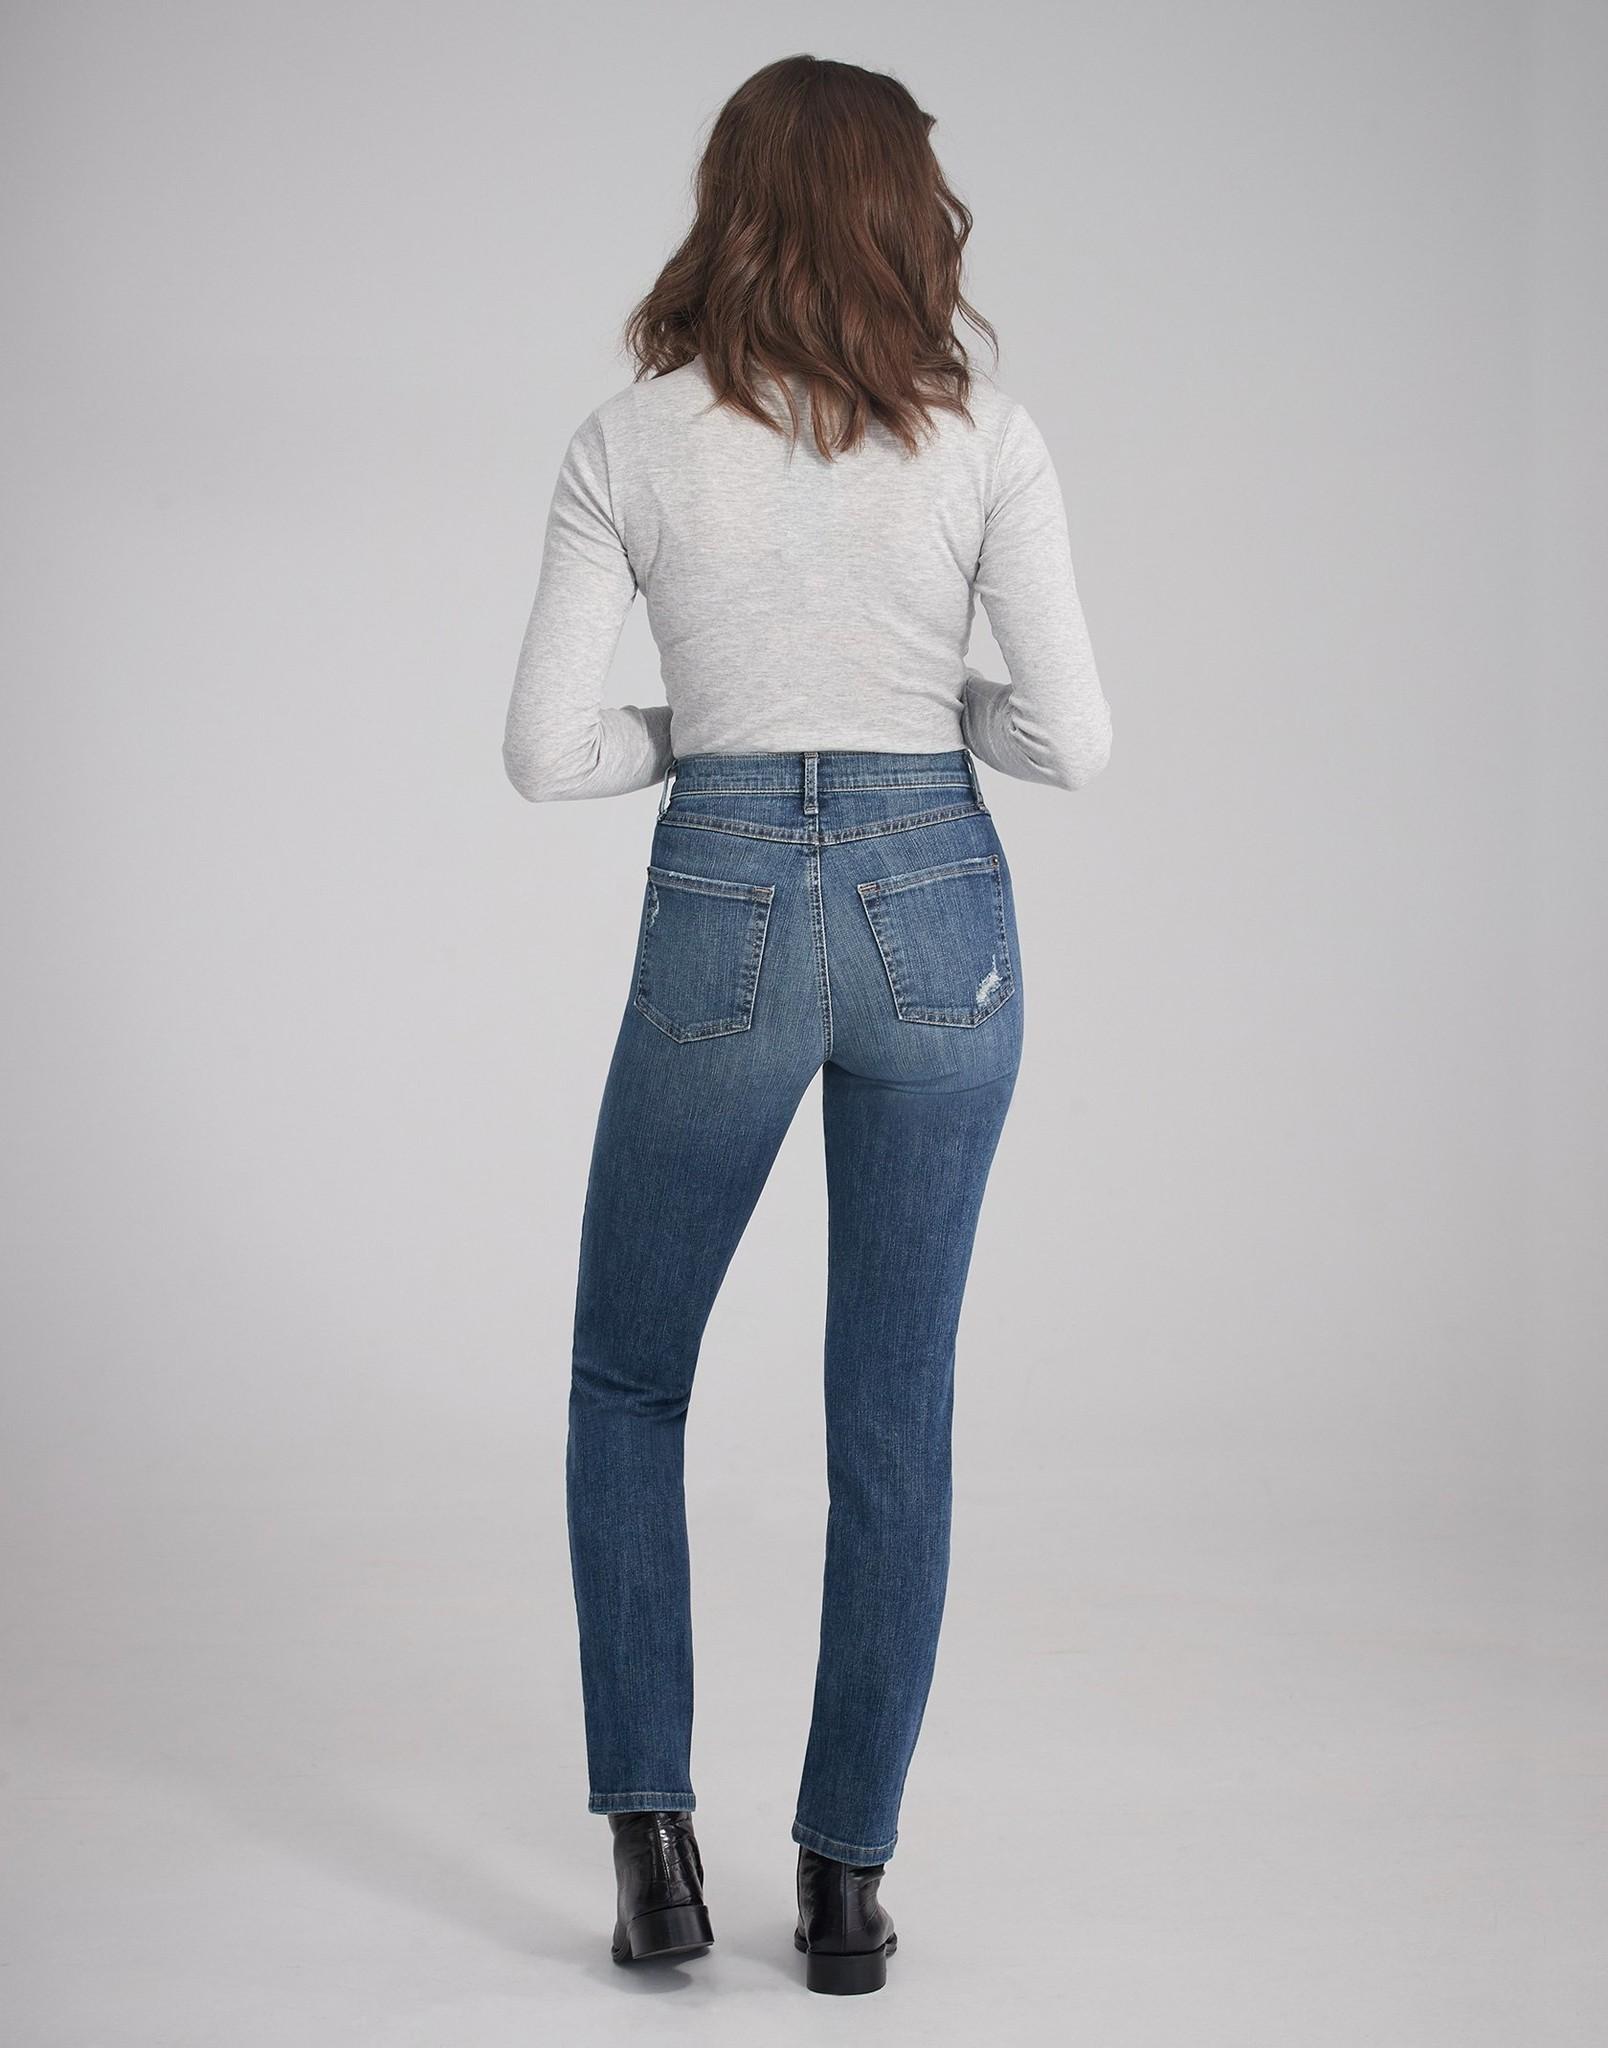 Yoga Jeans EMILY SLIM JEANS / Chia